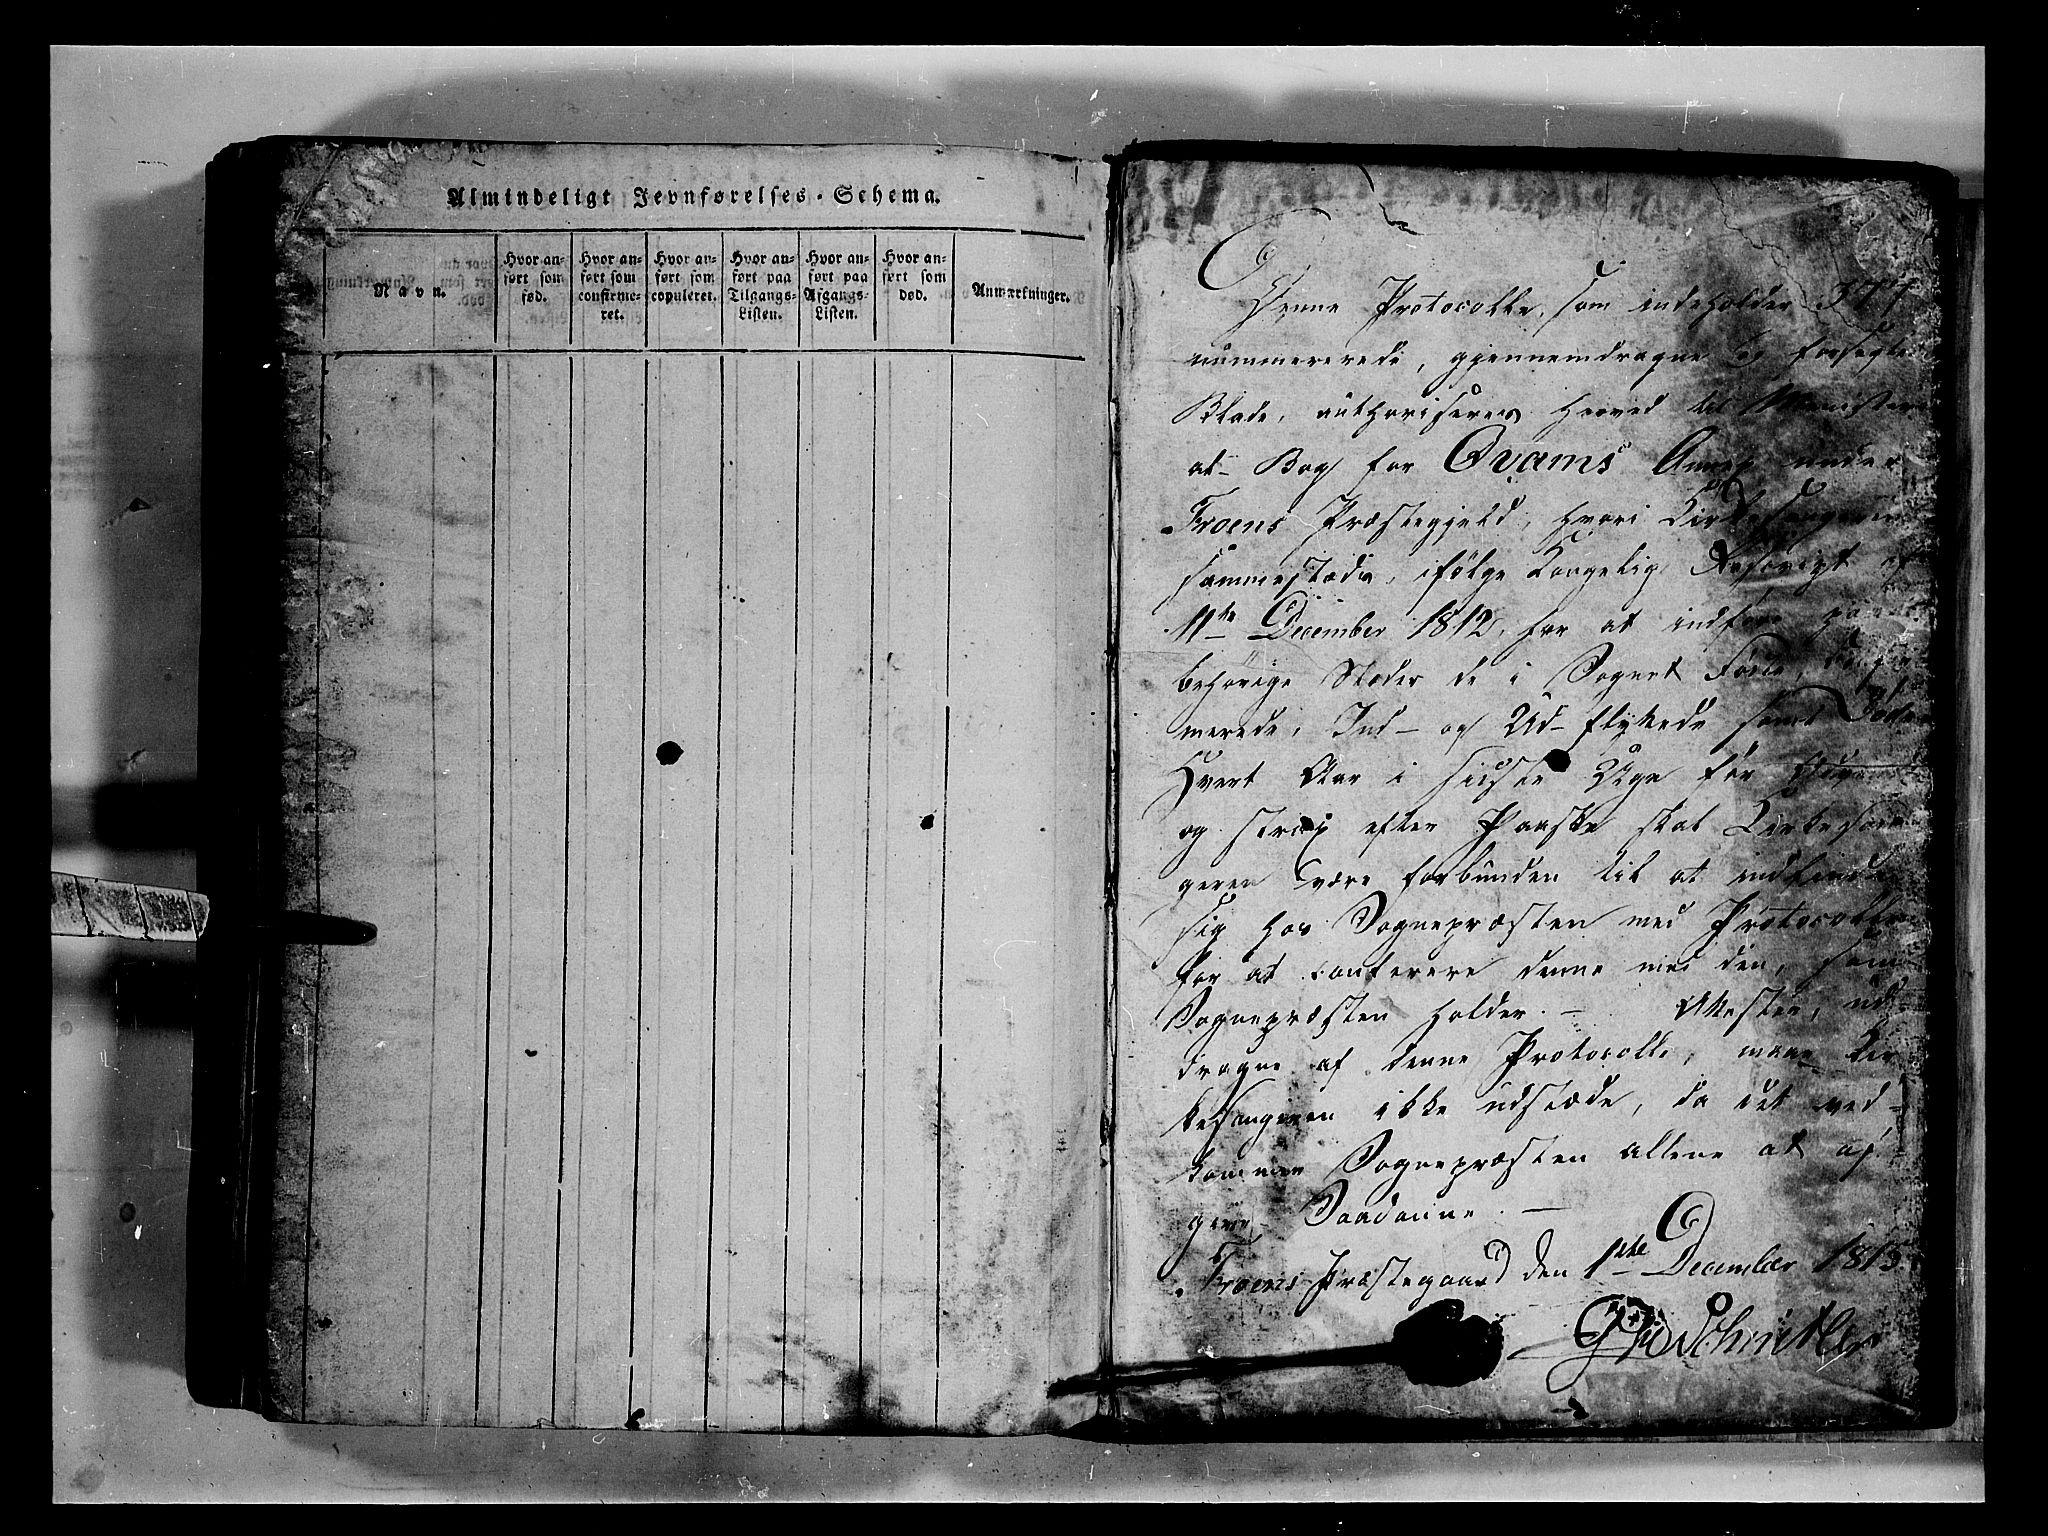 SAH, Fron prestekontor, H/Ha/Hab/L0002: Klokkerbok nr. 2, 1816-1850